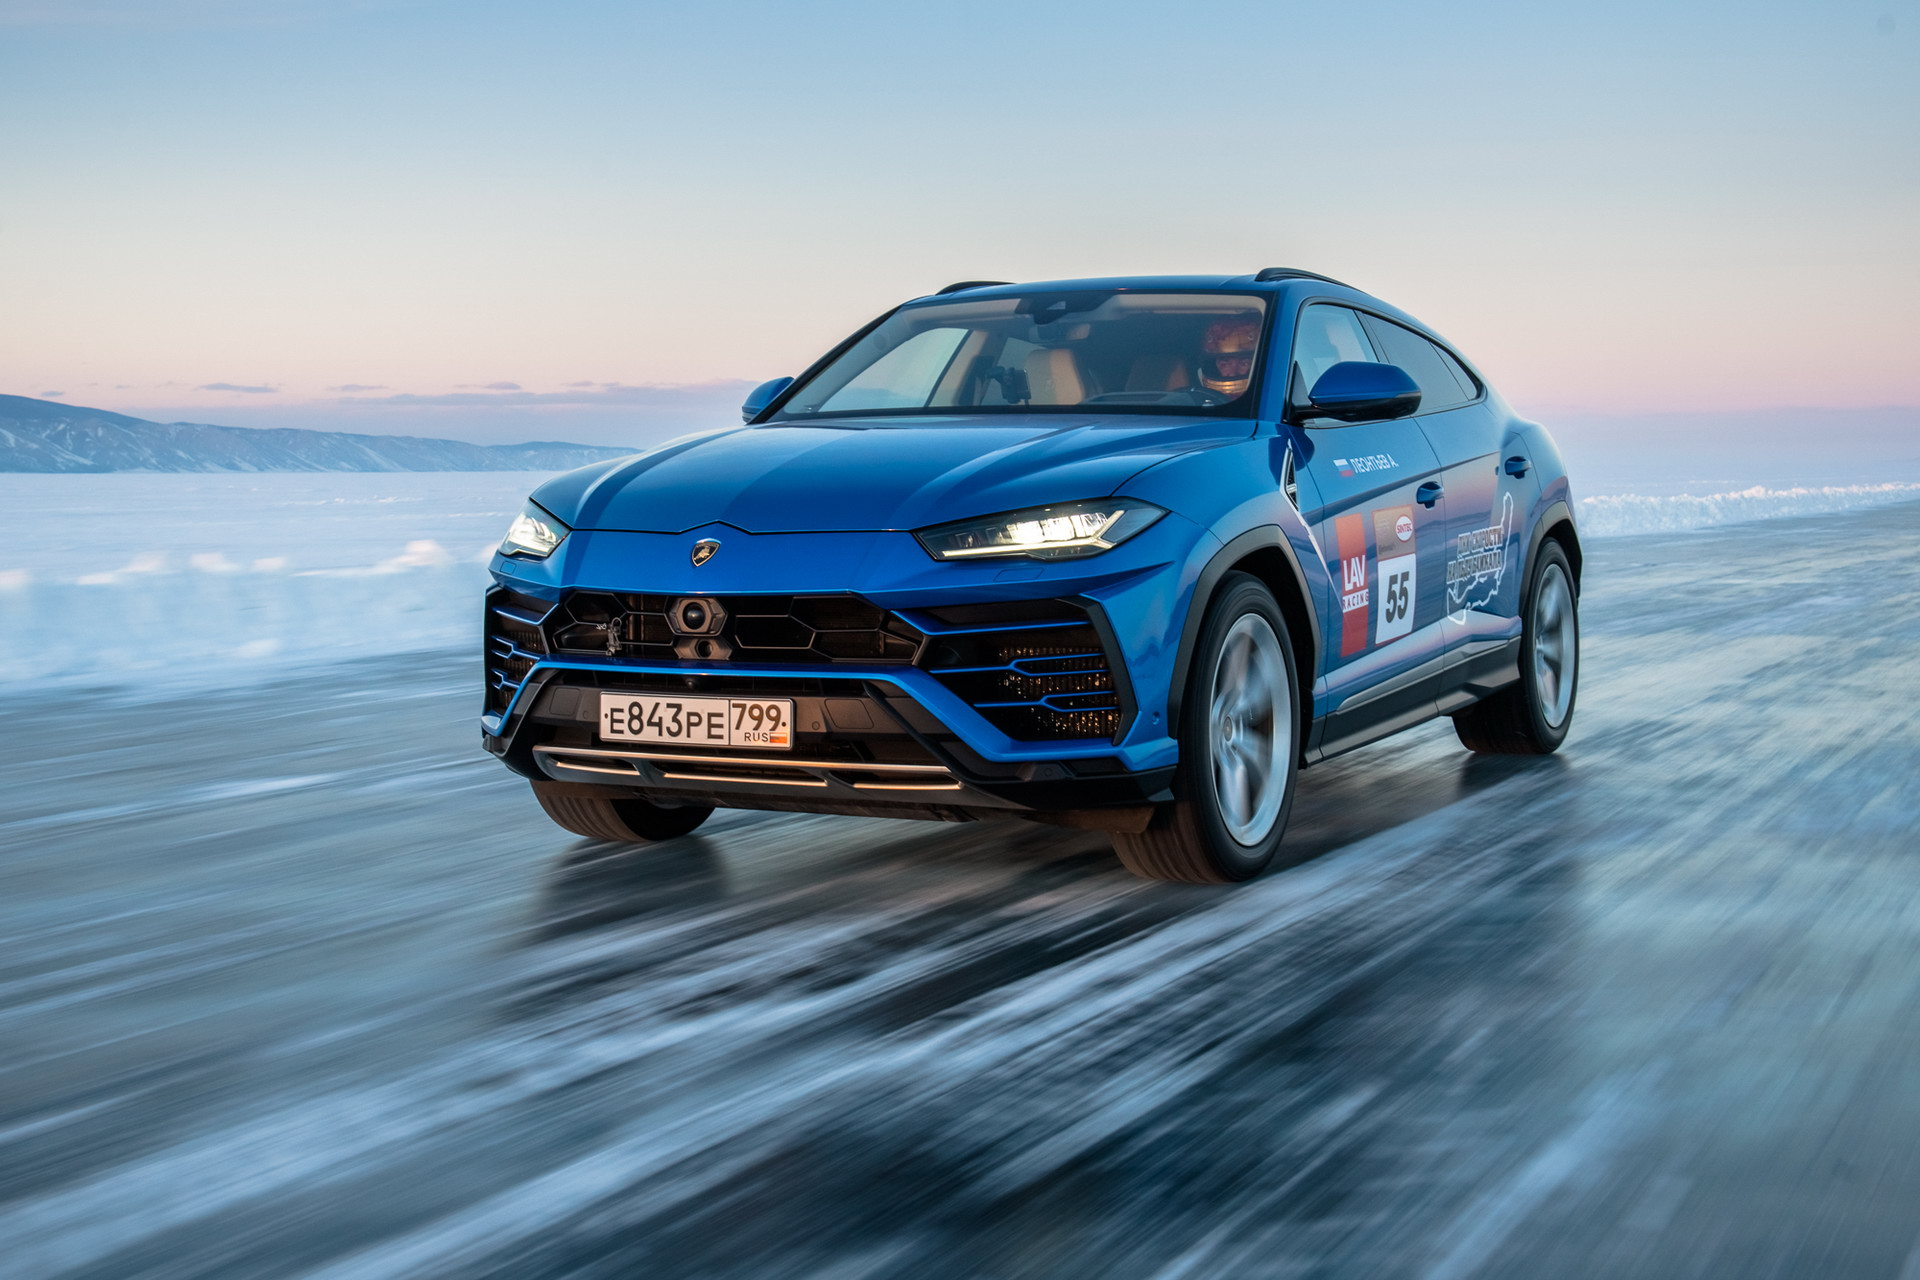 image-of-Lamborghini-Urus-set-new-record-on-ice